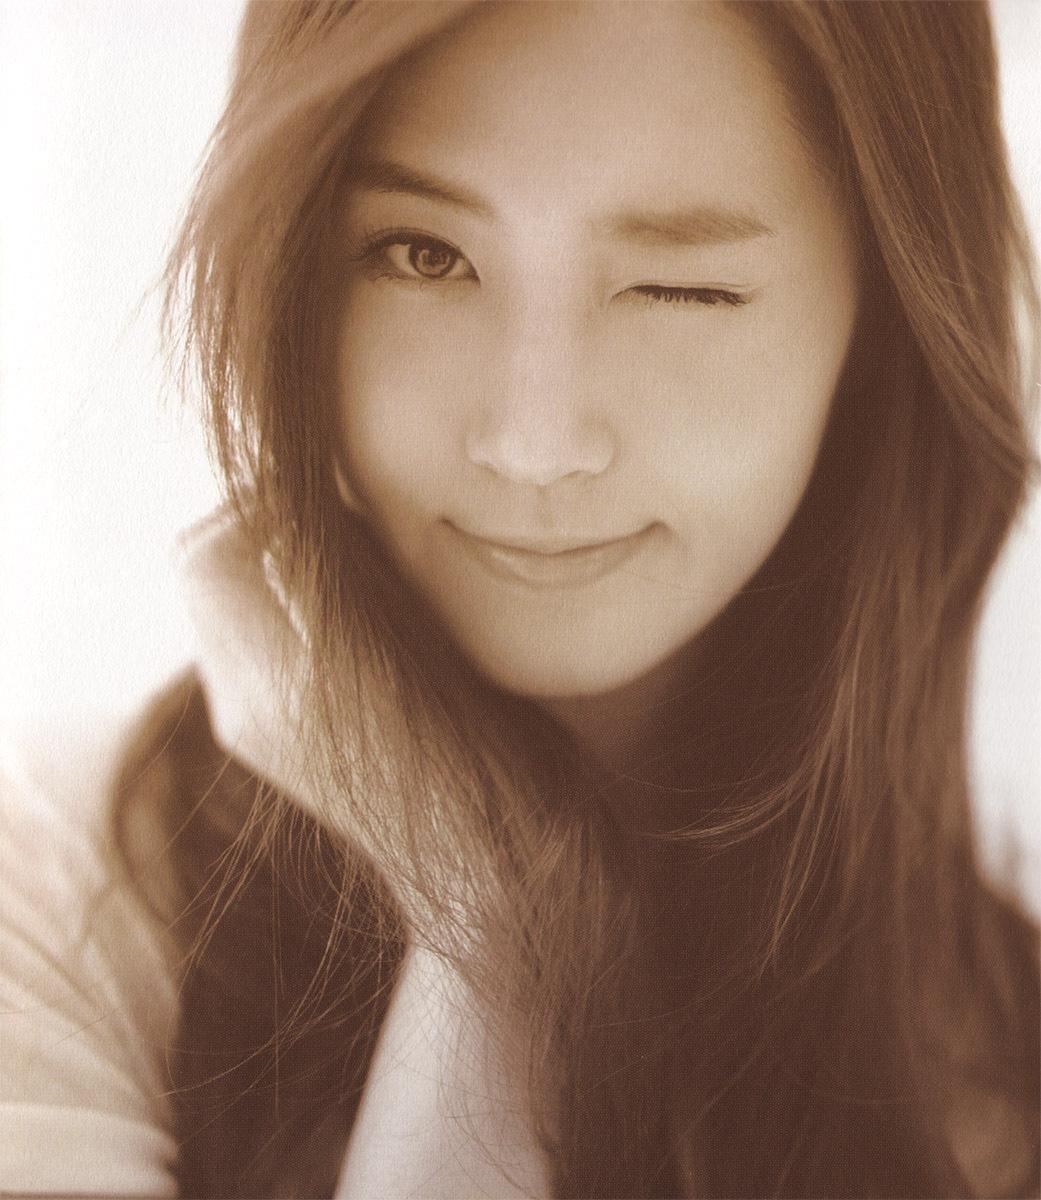 Yuri Gee Ver. 3 - girls-generation-snsd photo